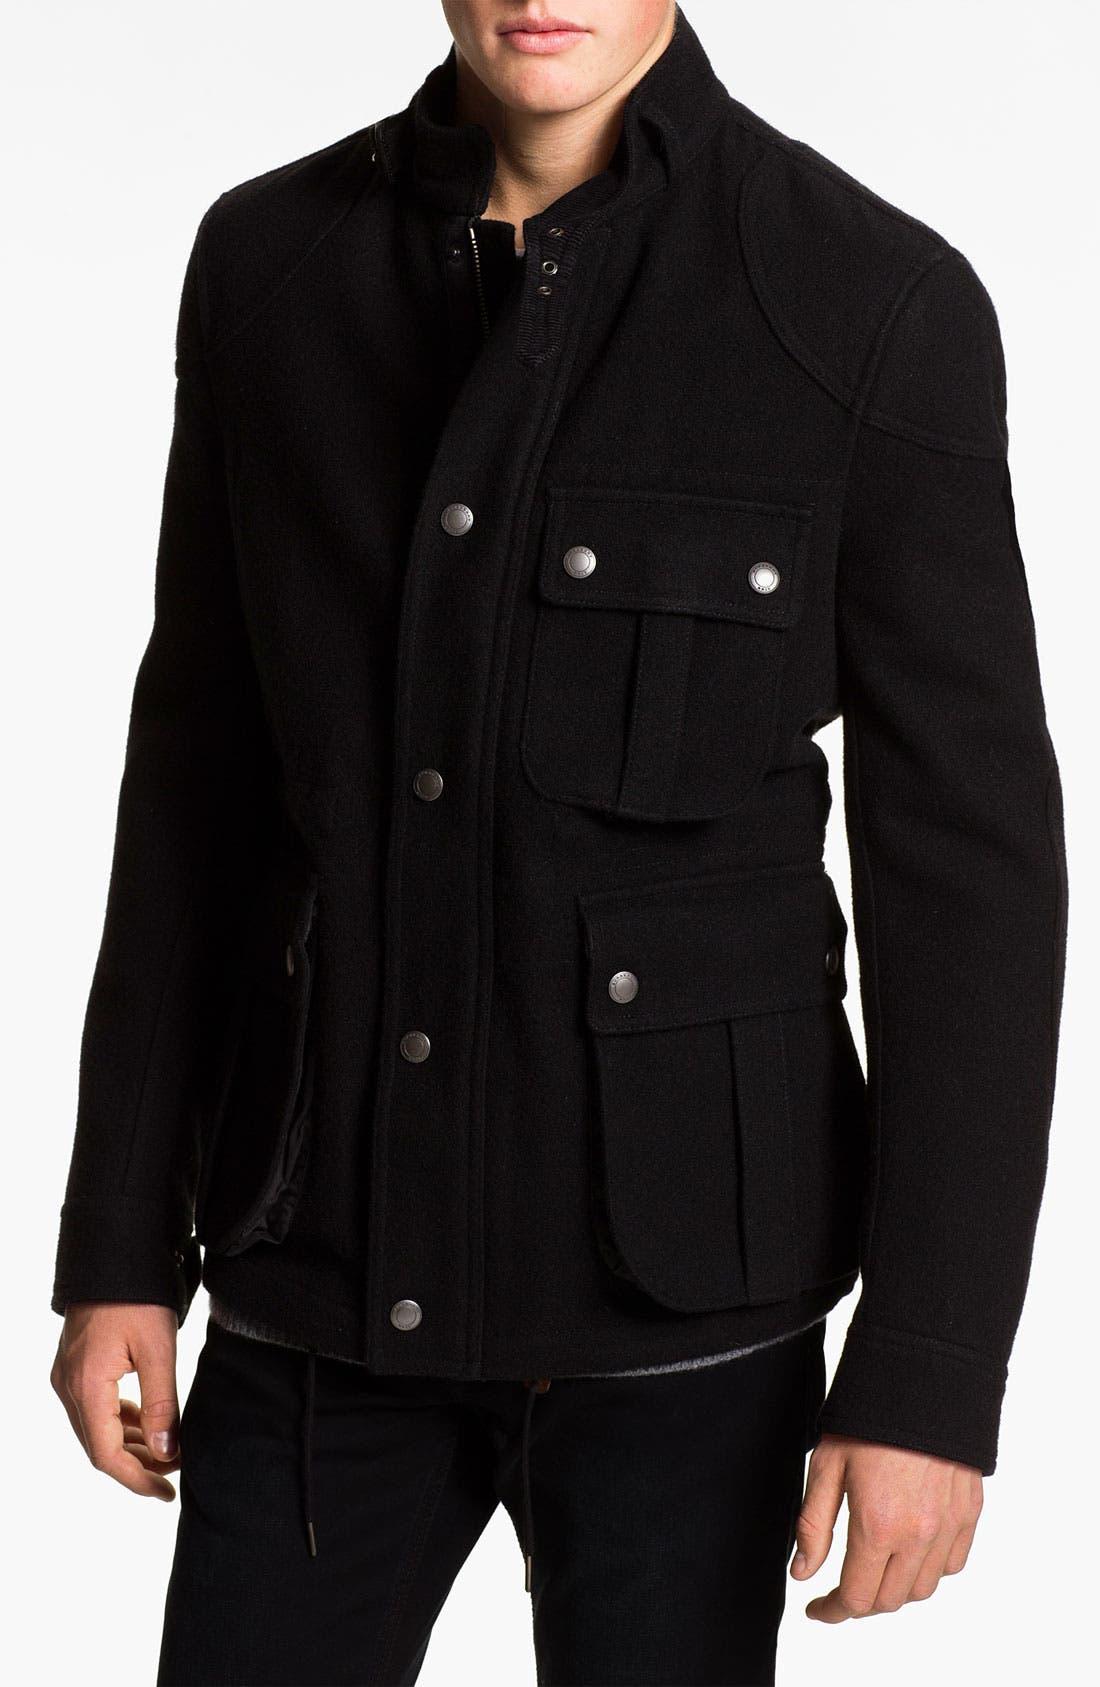 Main Image - Burberry Brit Wool Blend Field Jacket